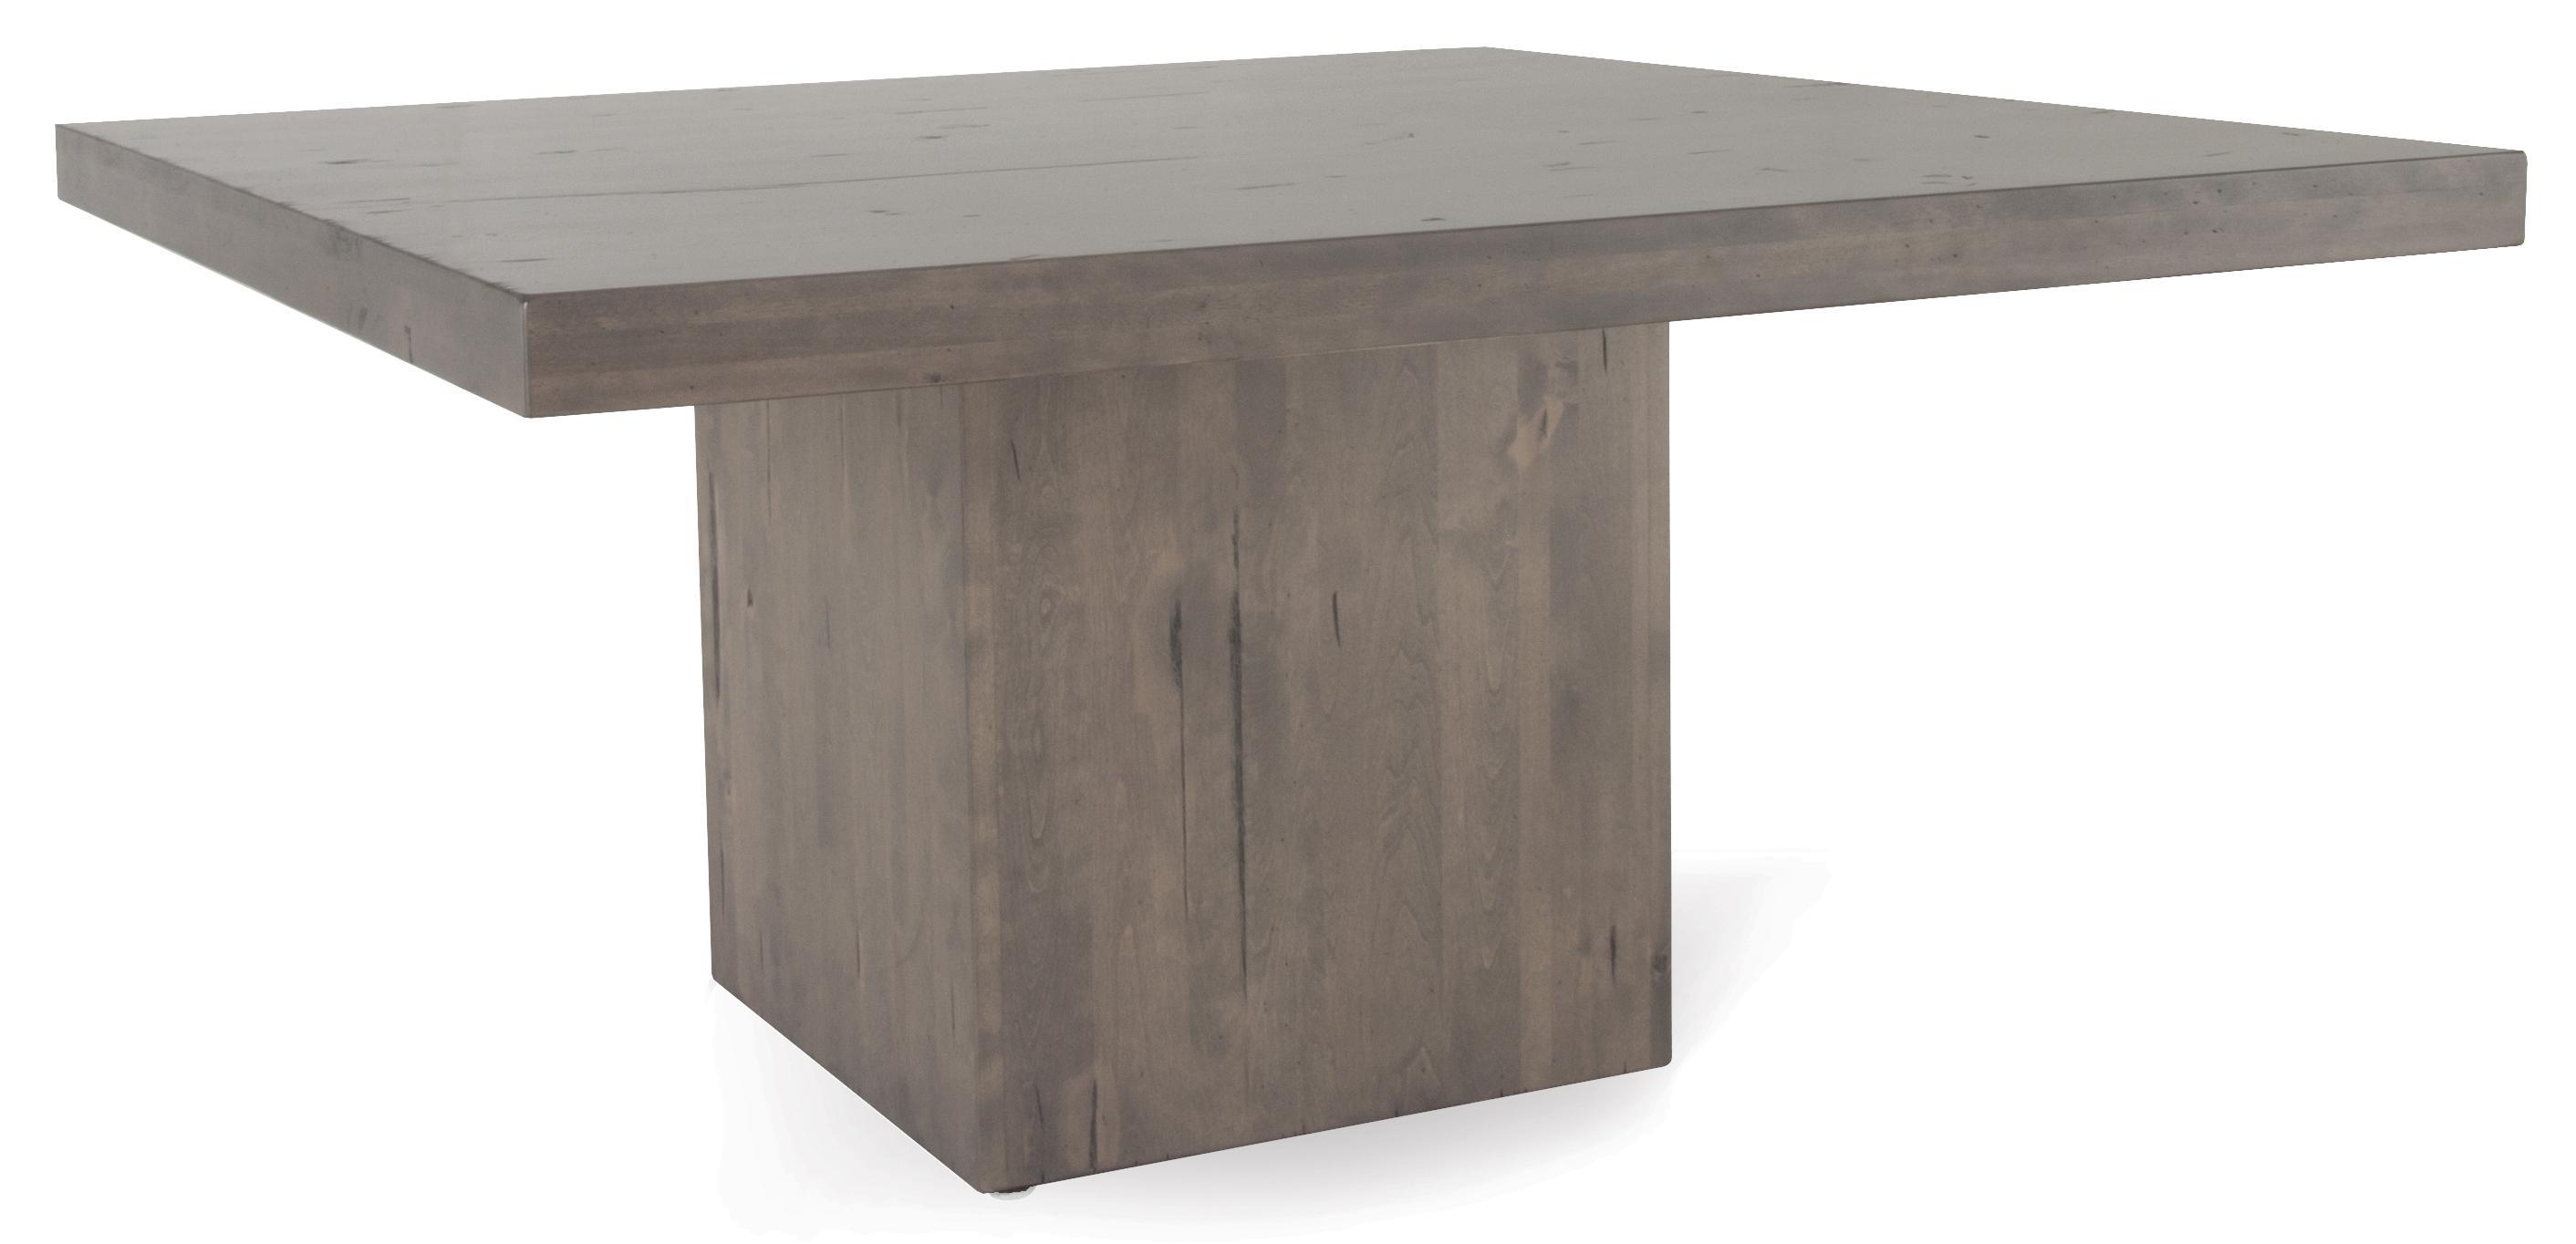 Canadel Loft   Custom Diningu003cbu003eCustomizableu003c/bu003e Square Table ...